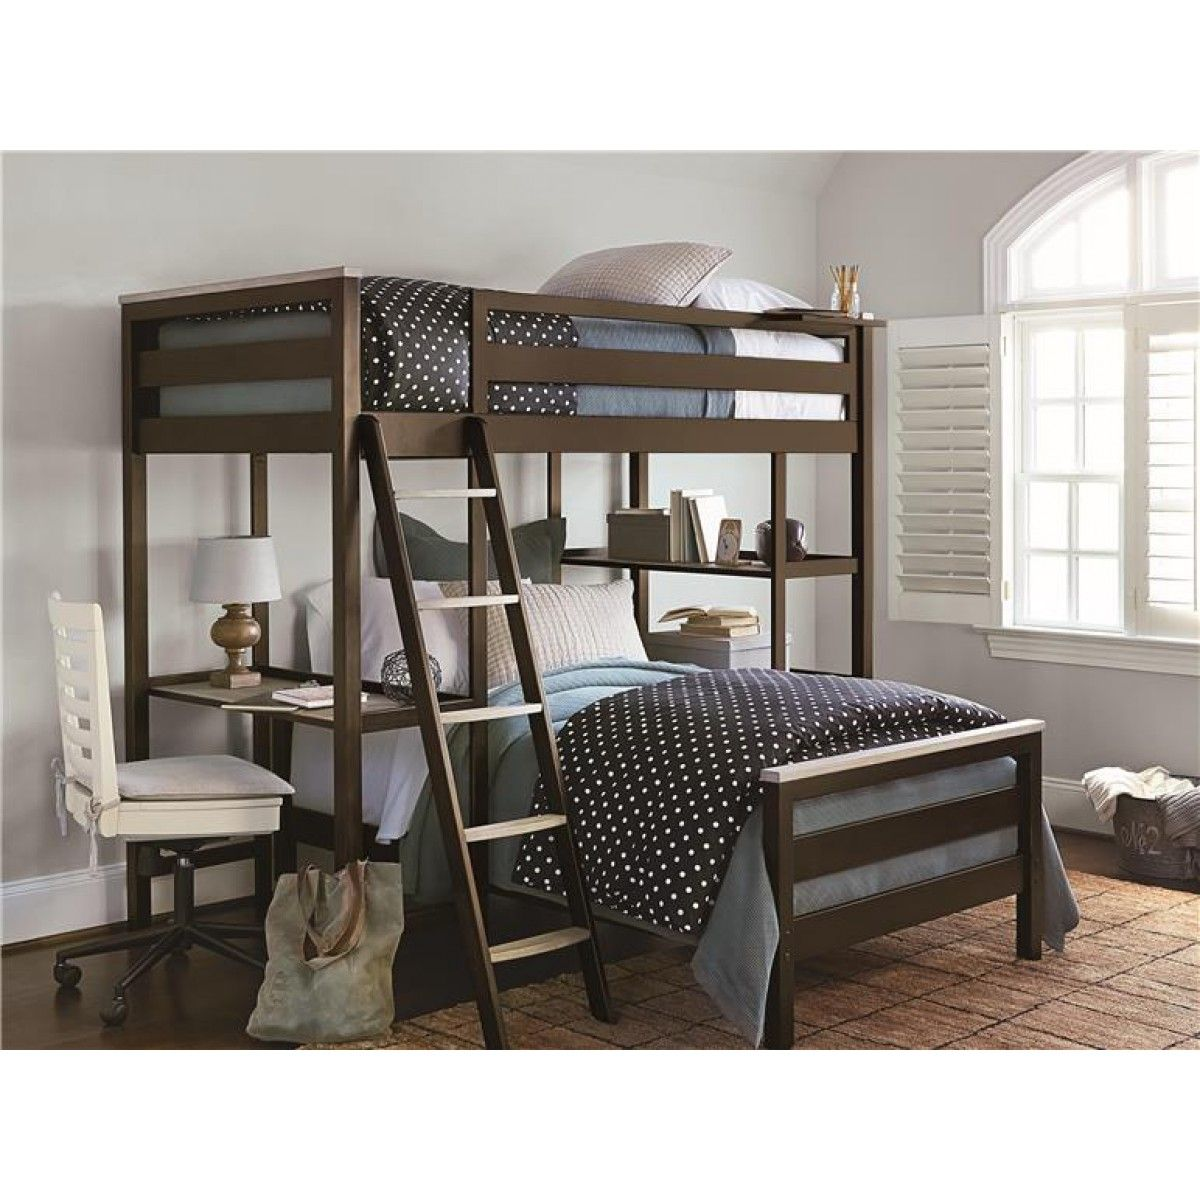 Universal Furniture Smartstuff myRoom Bunk Bed Twin twin